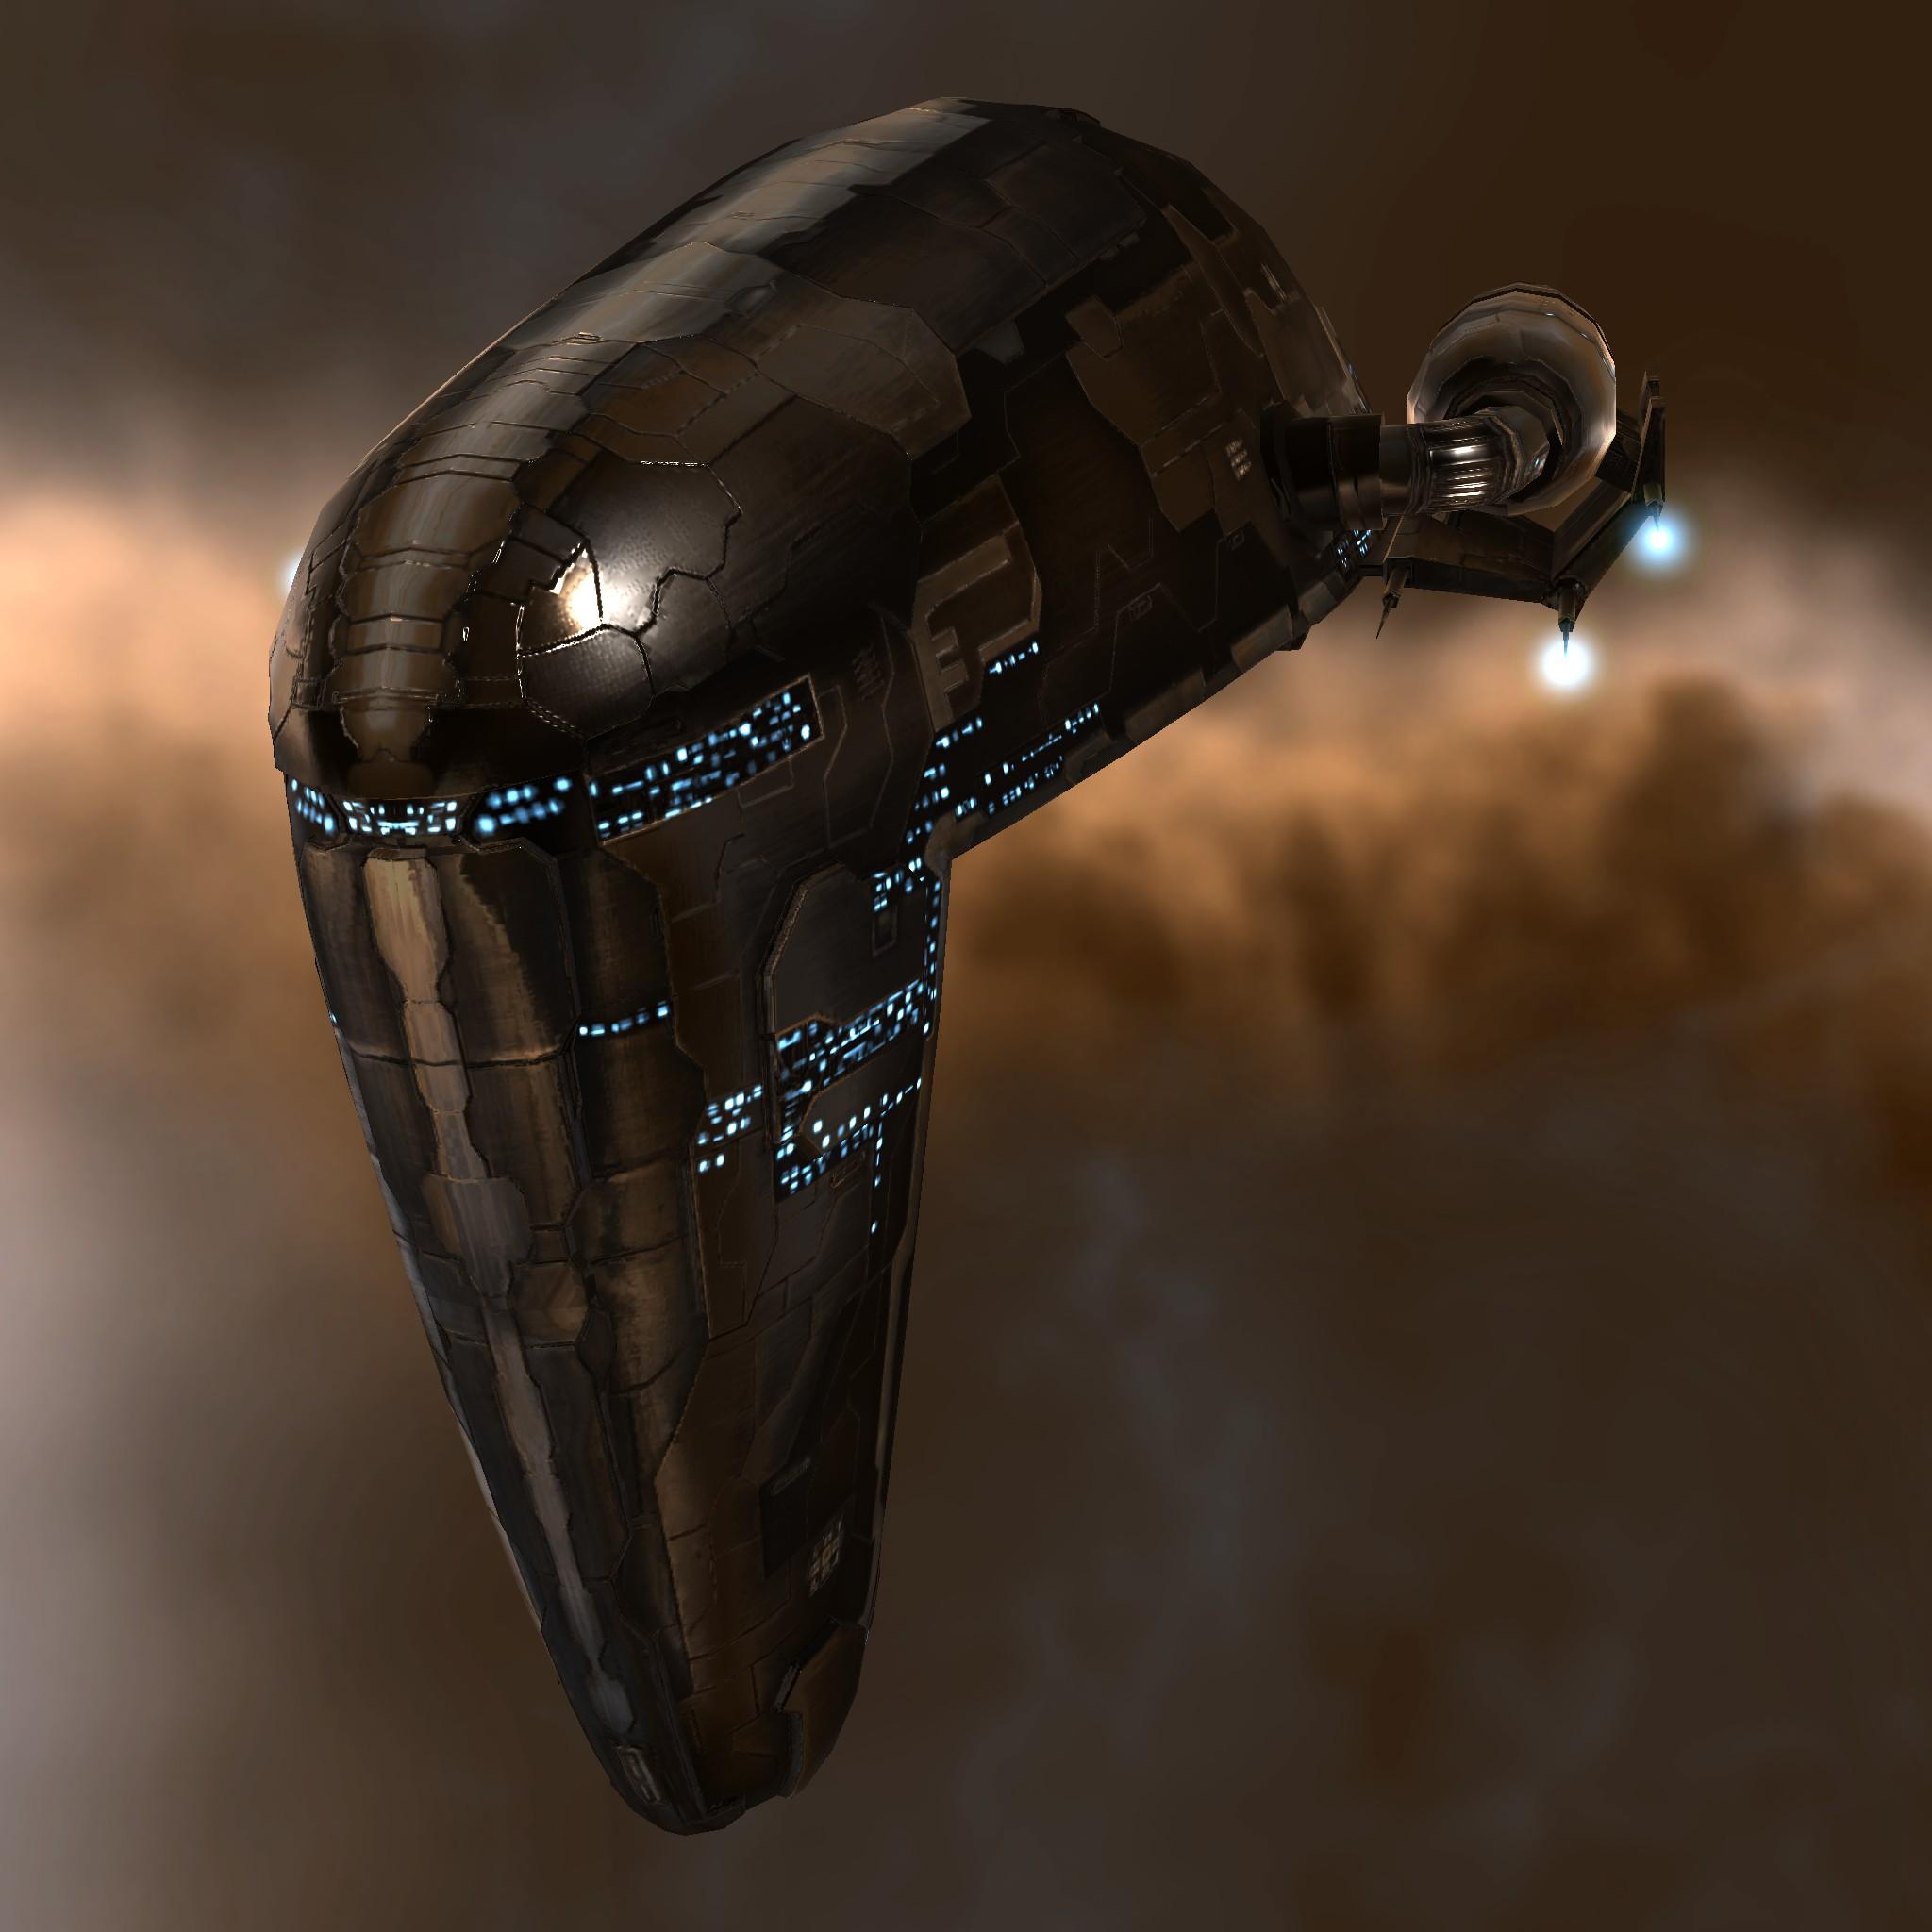 Eve ship sacrilege sacrilege malvernweather Images